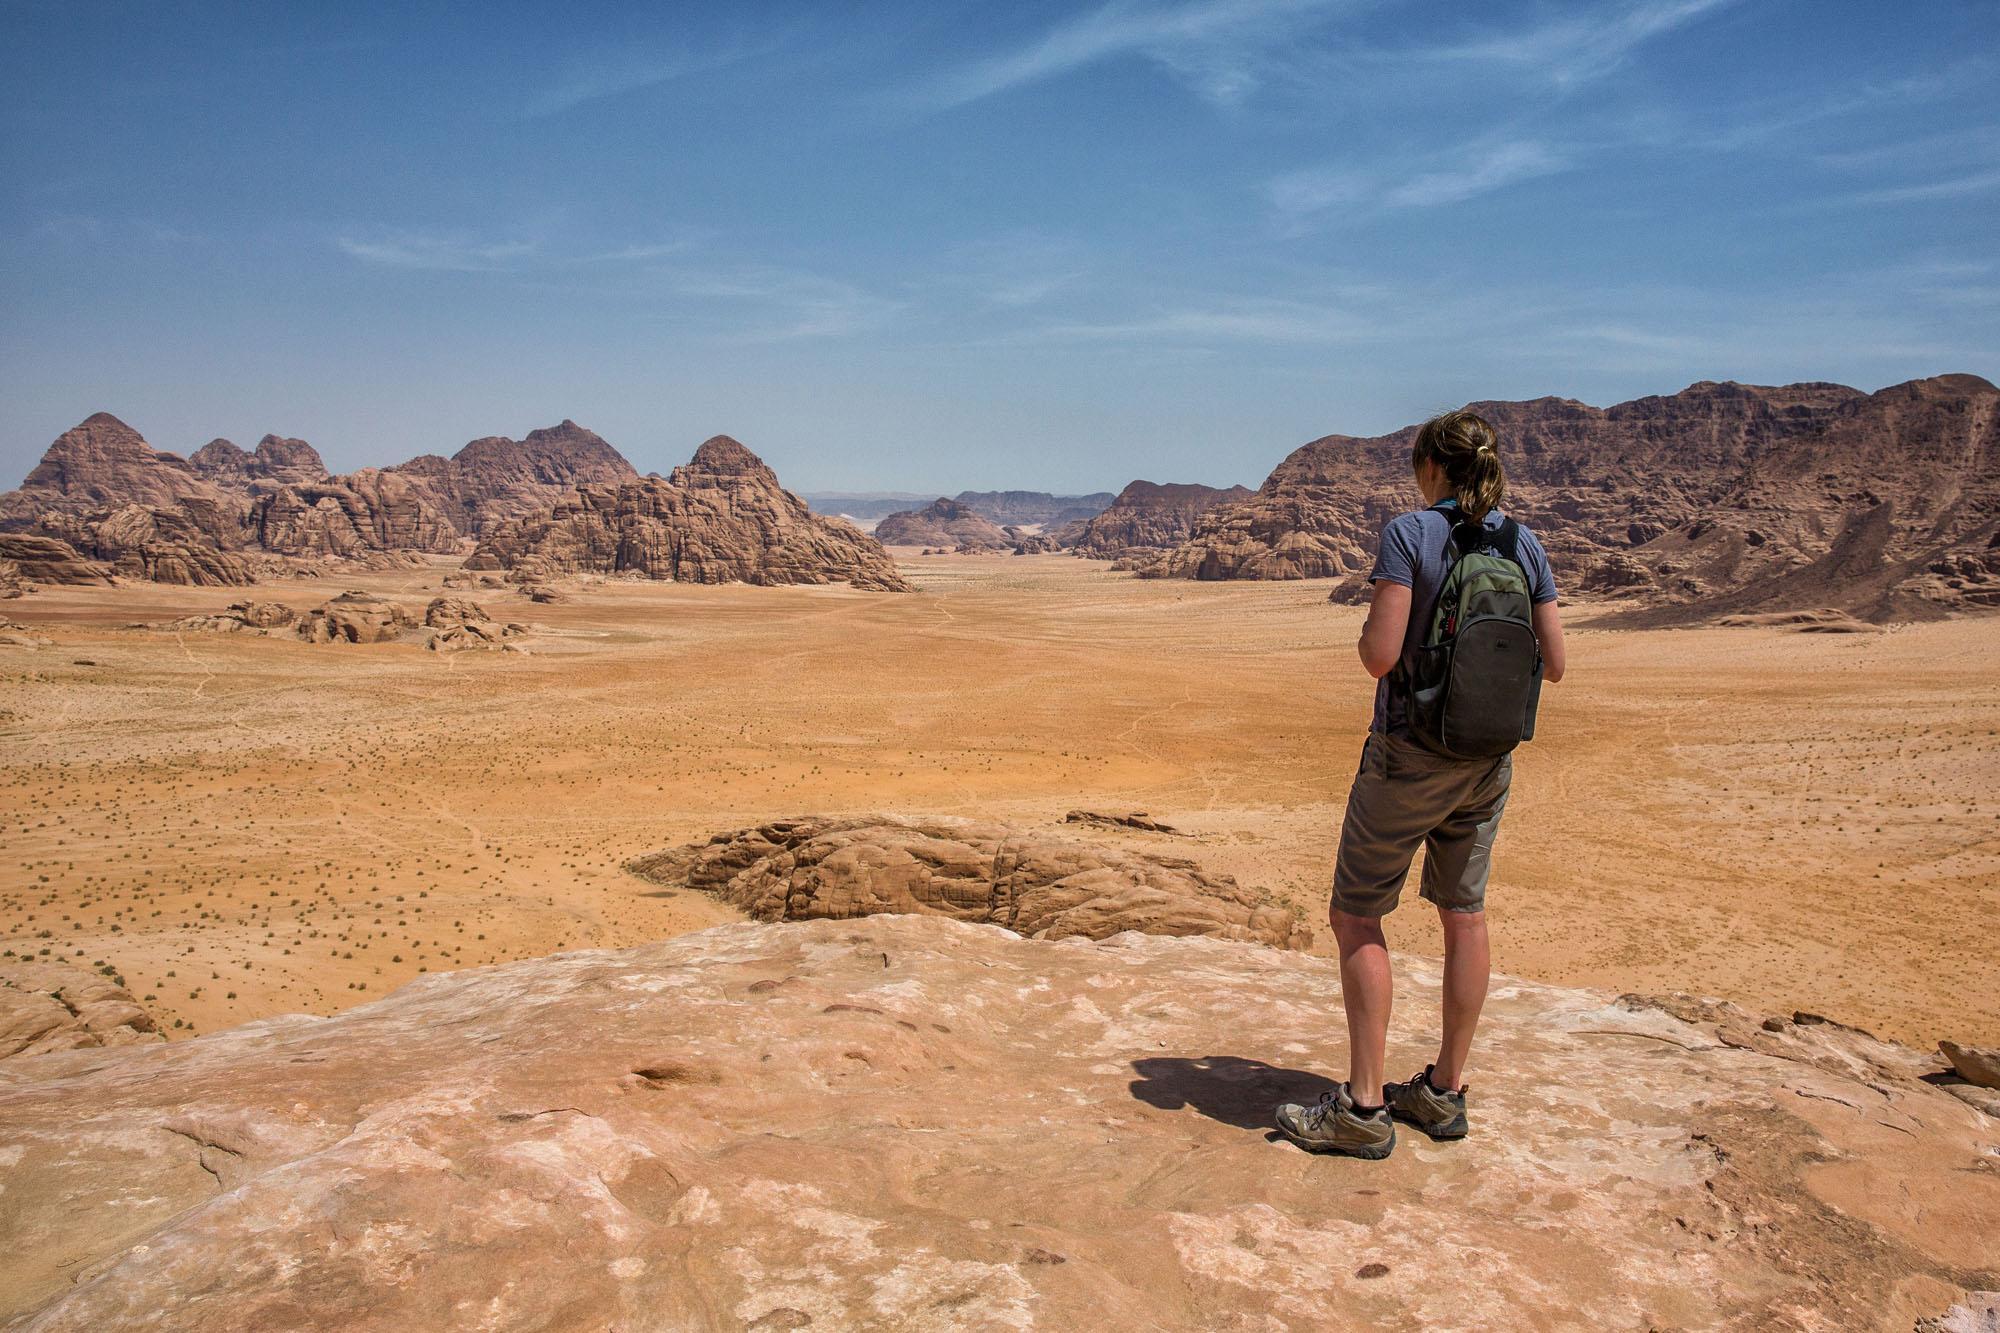 Highlights from Jordan and Israel